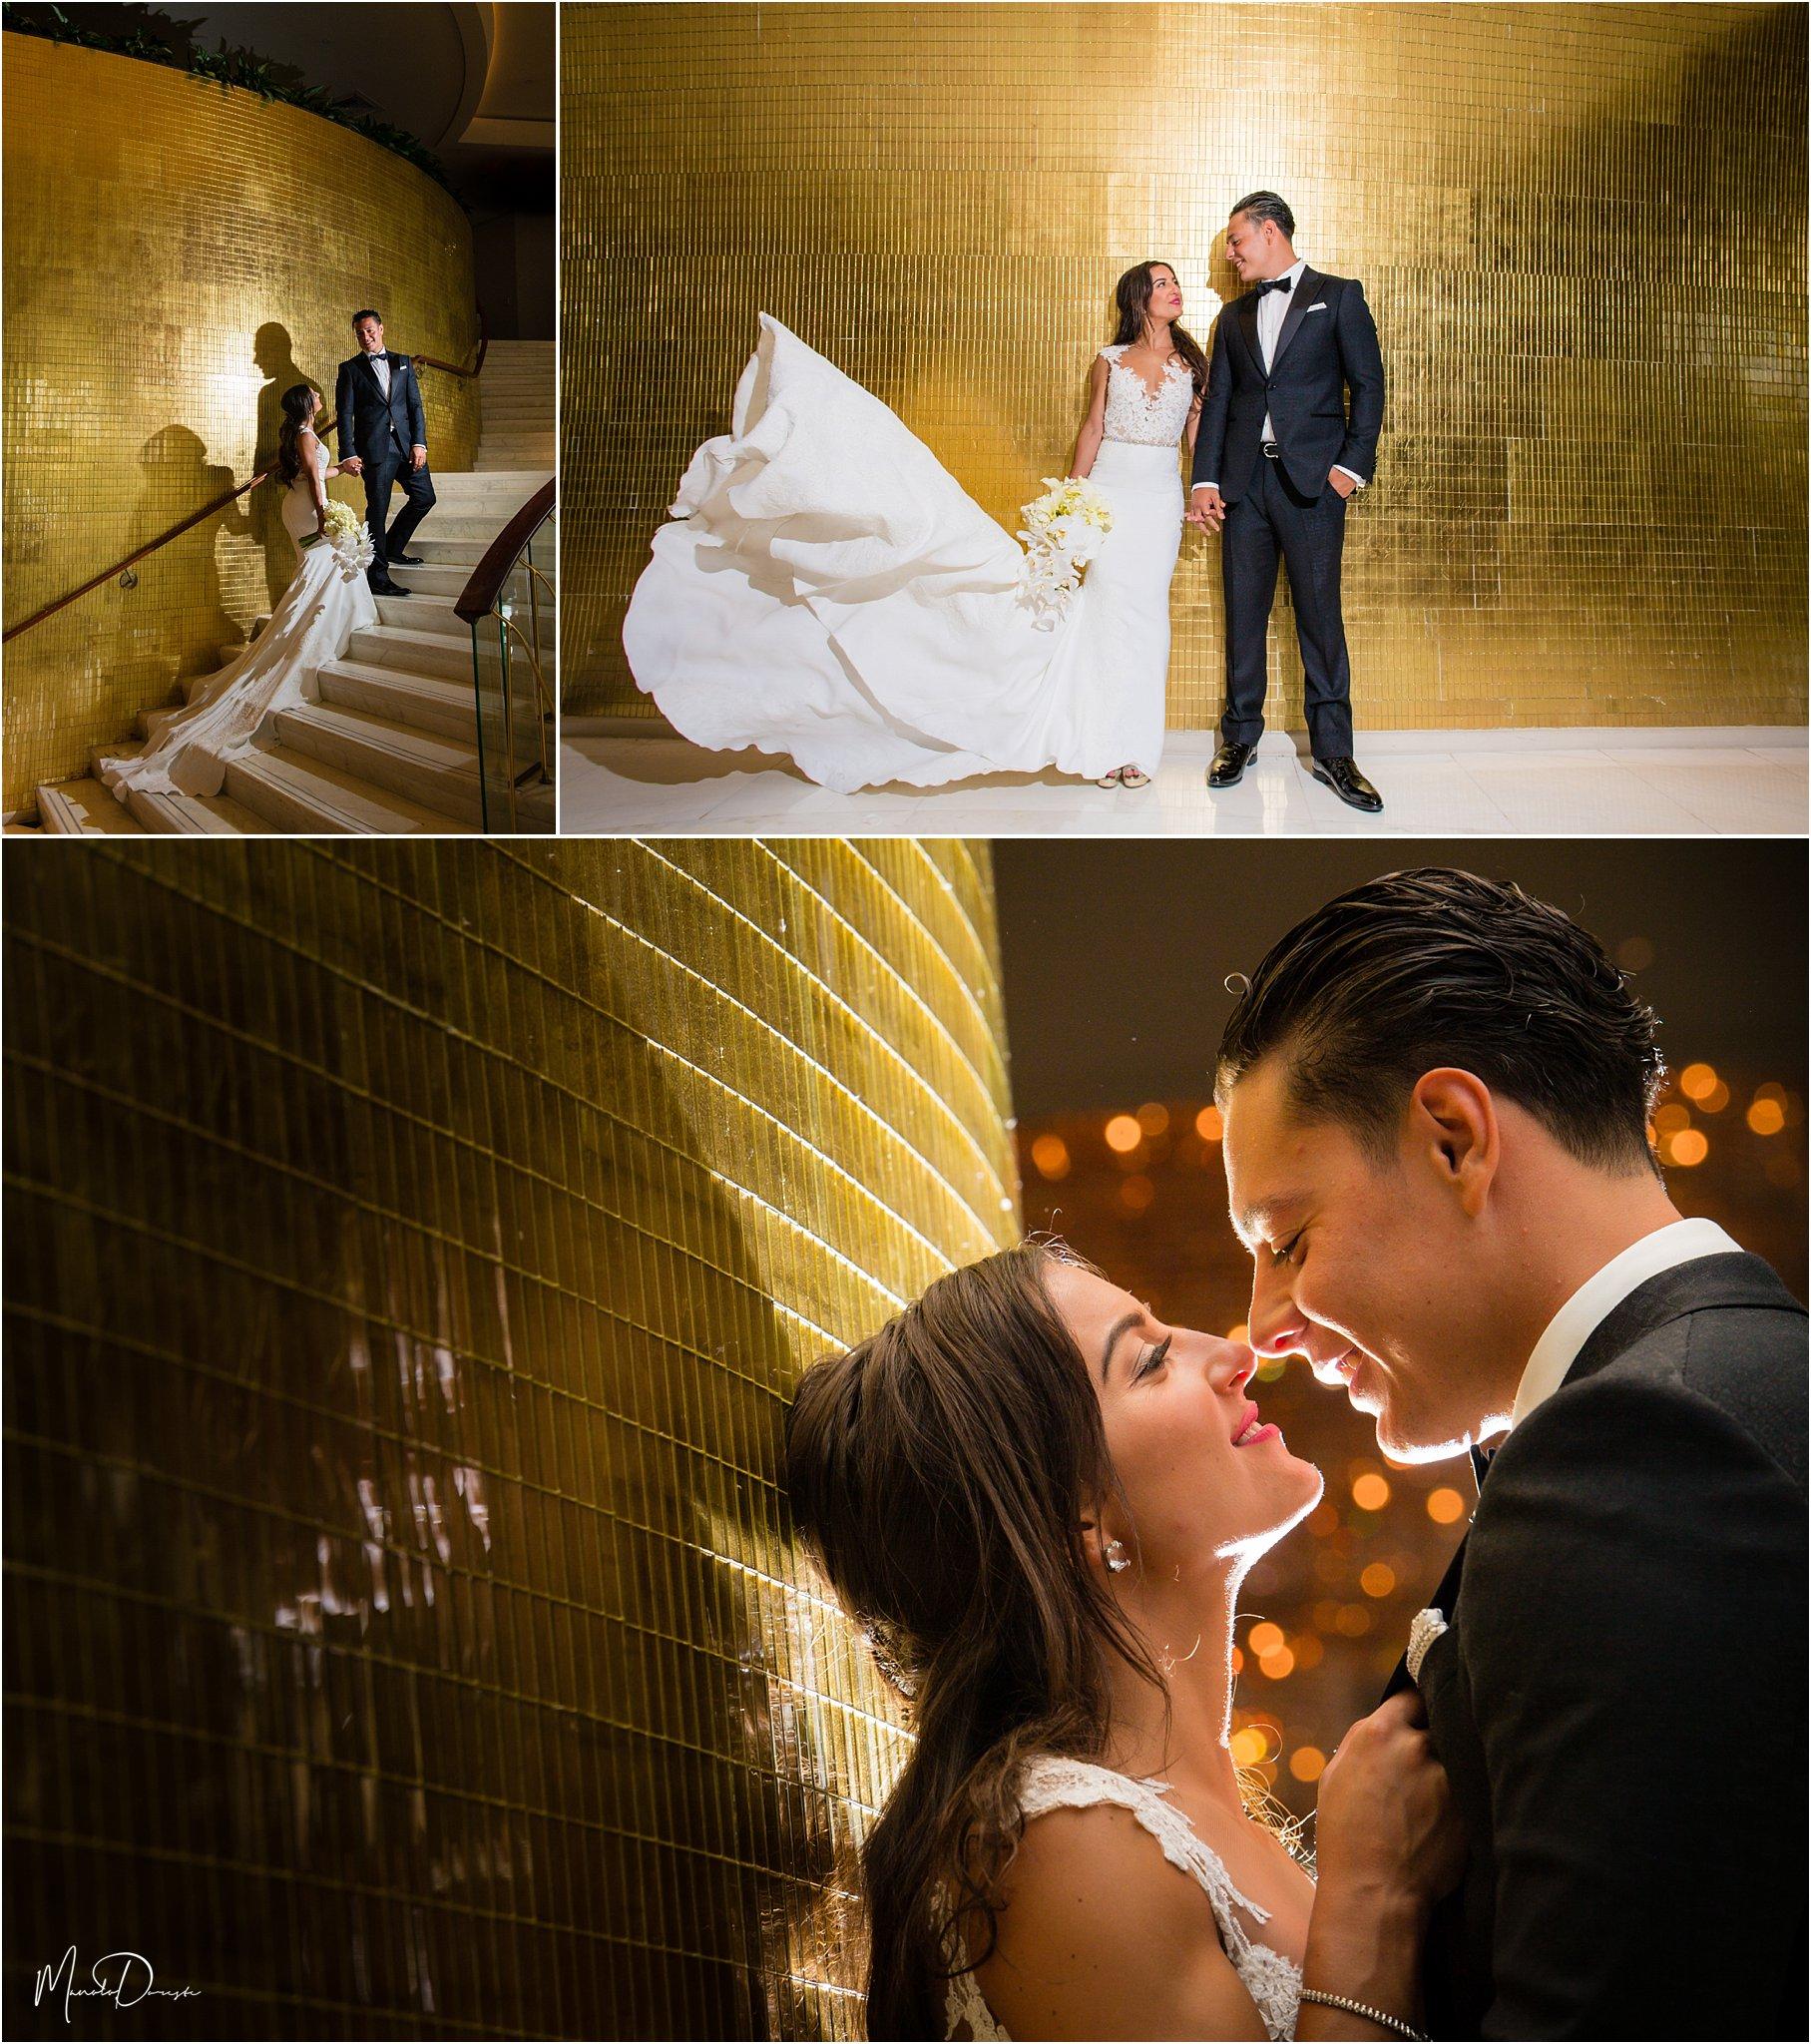 0329_ManoloDoreste_InFocusStudios_Wedding_Family_Photography_Miami_MiamiPhotographer.jpg